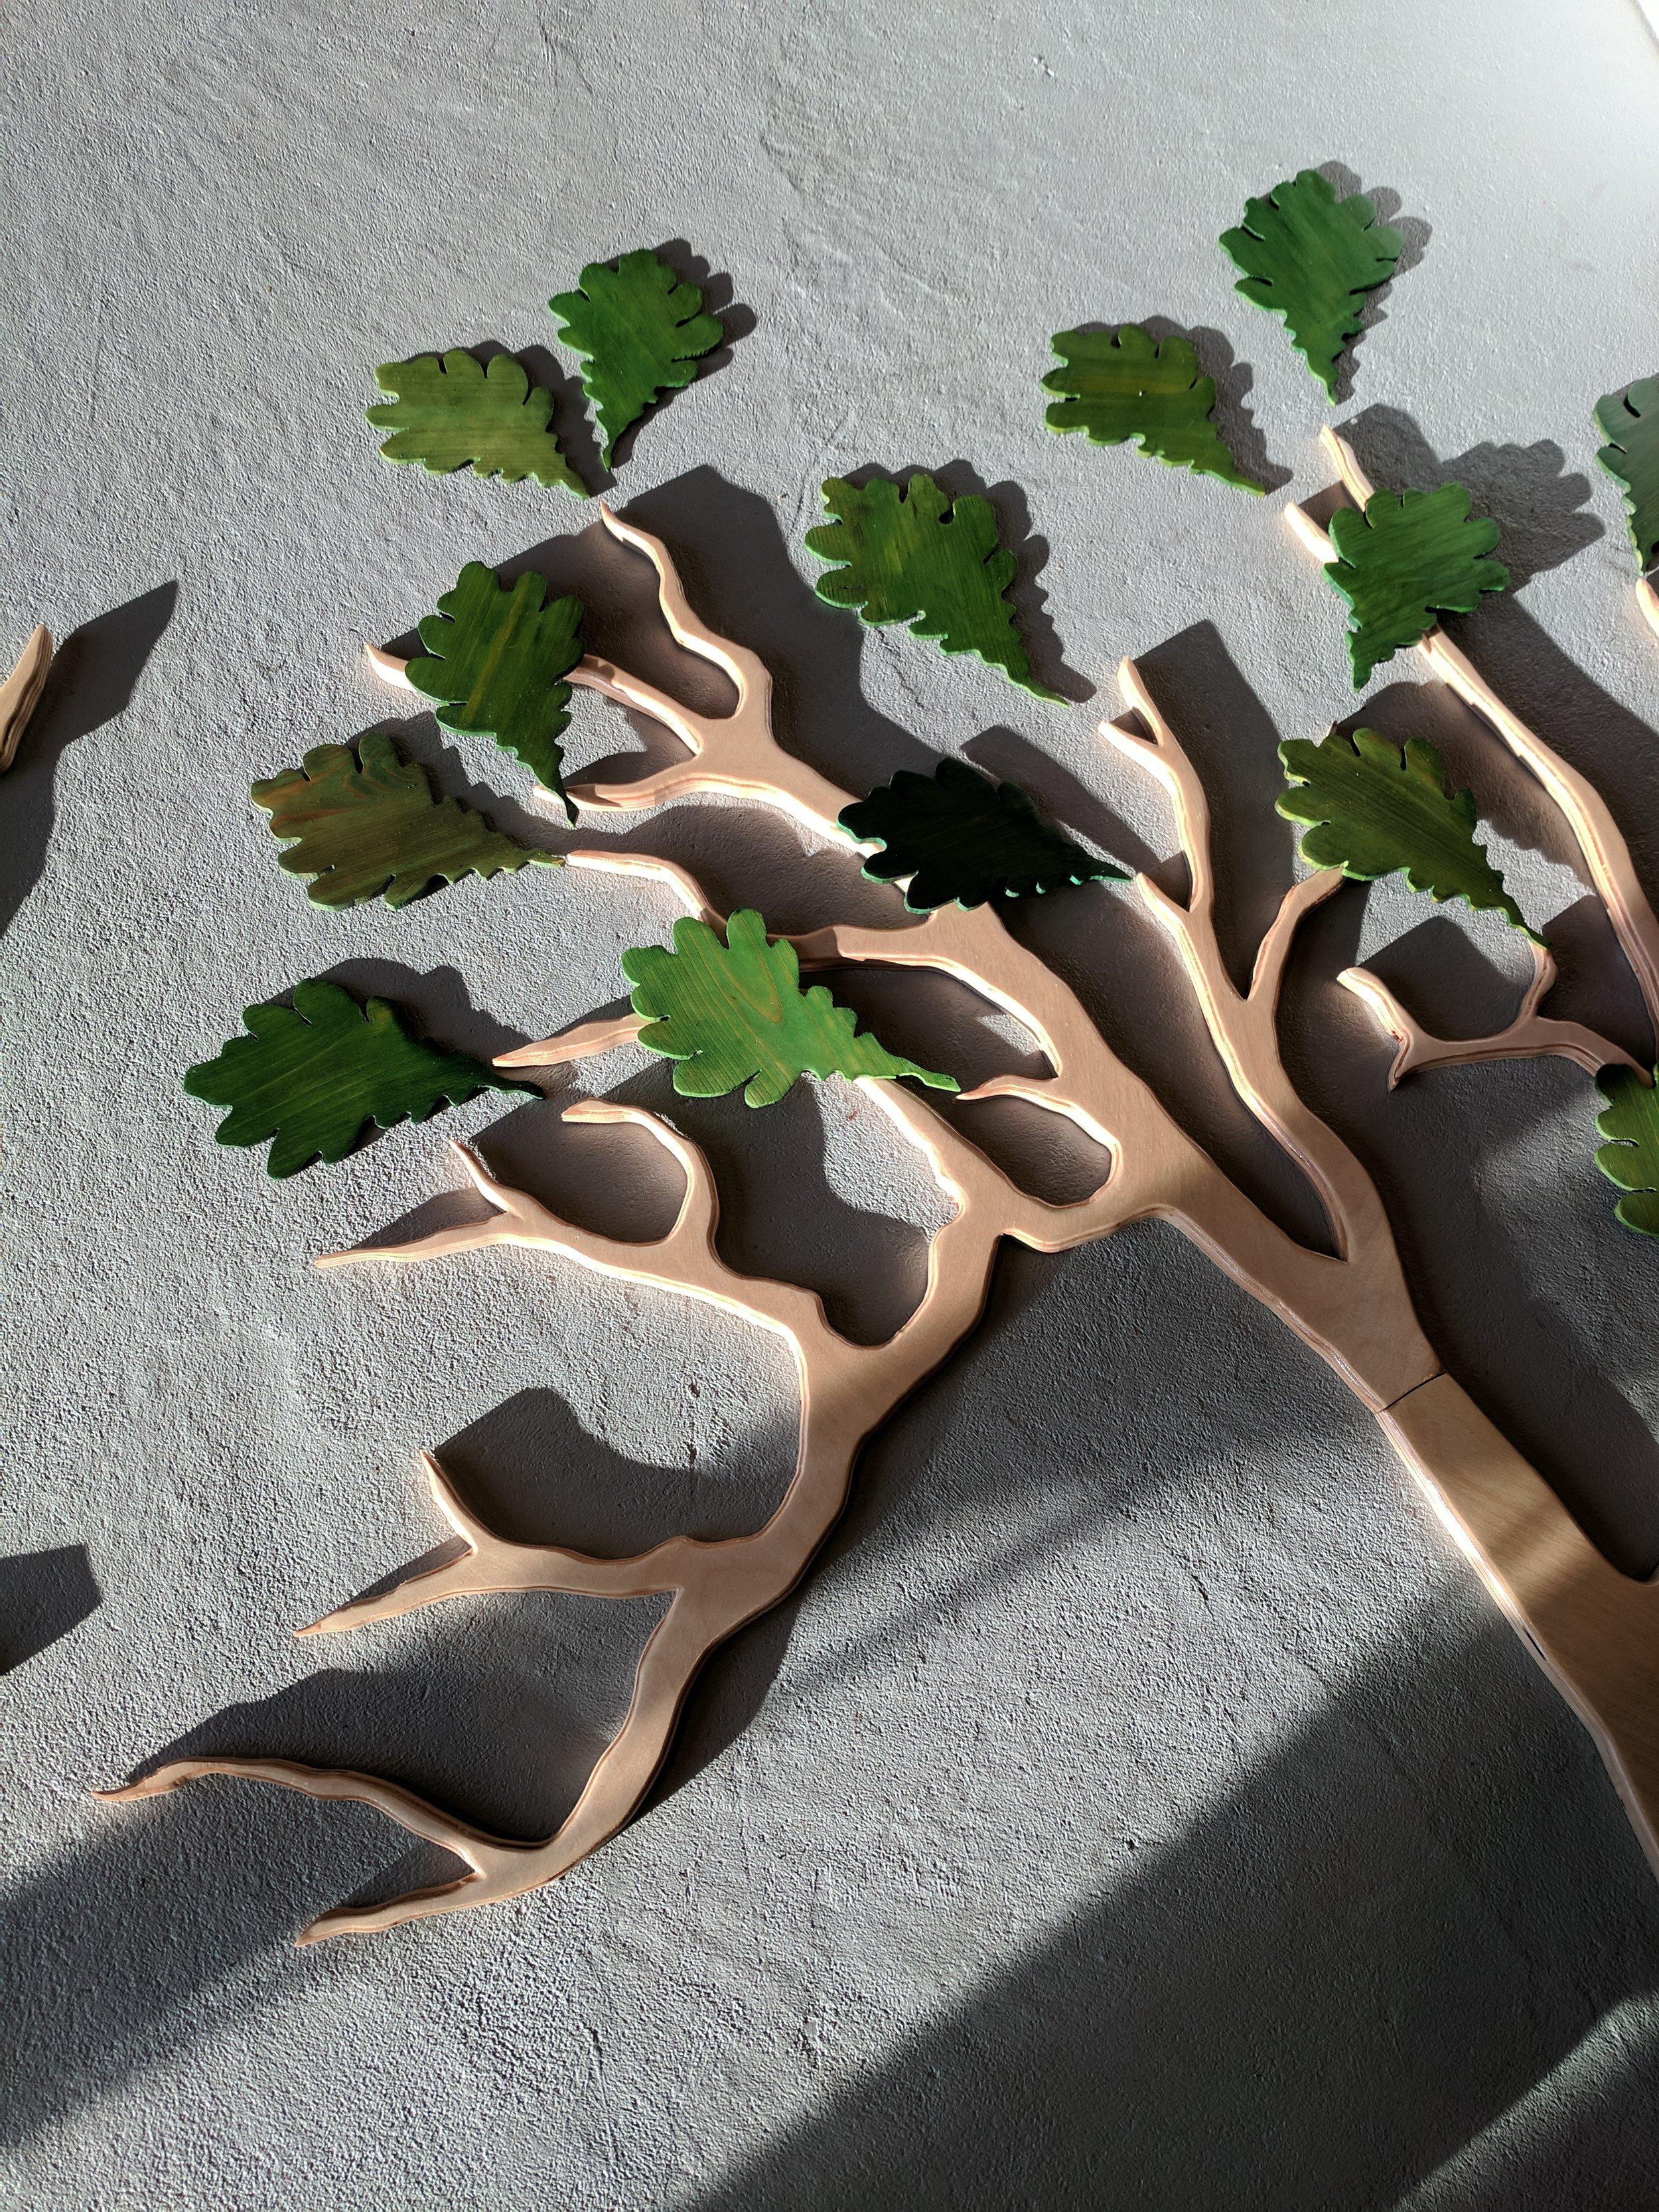 Leaf and limb detail